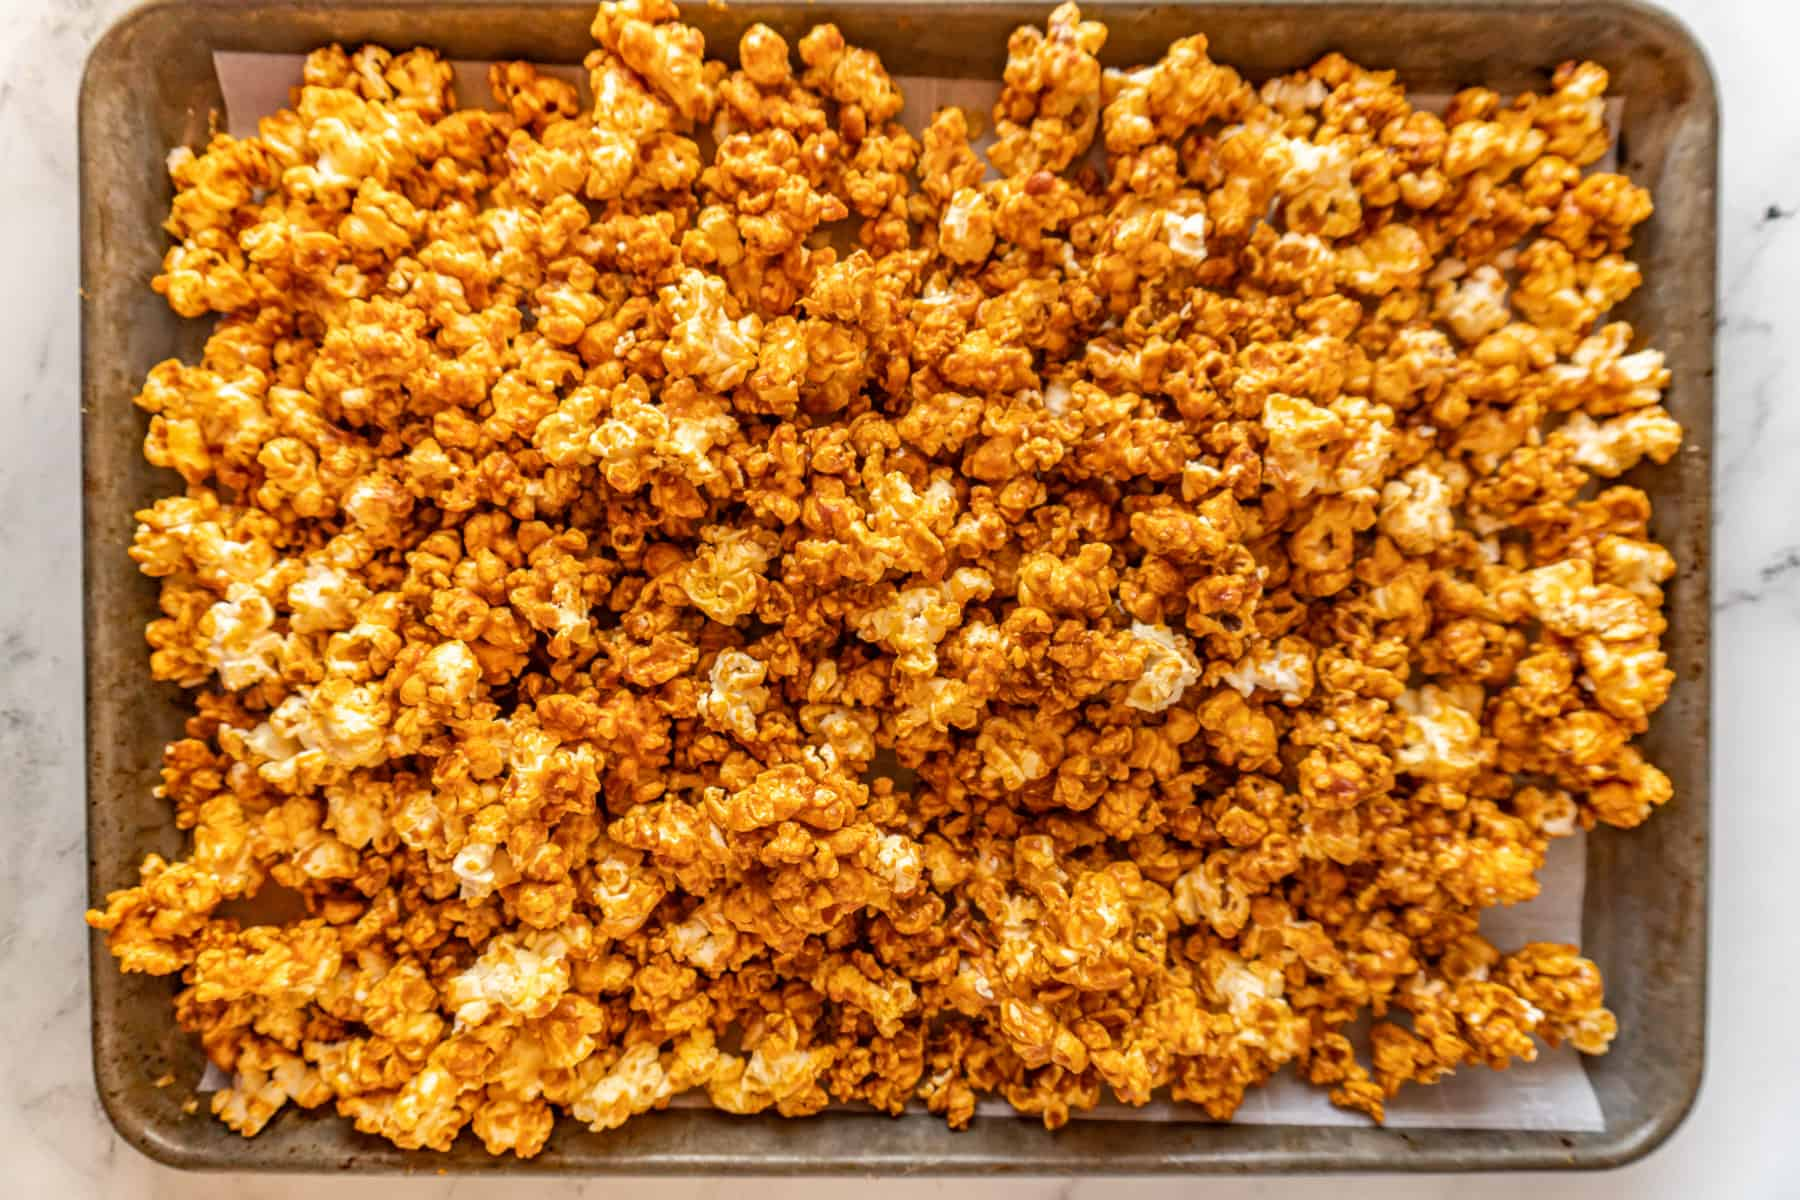 buffalo popcorn on baking sheet